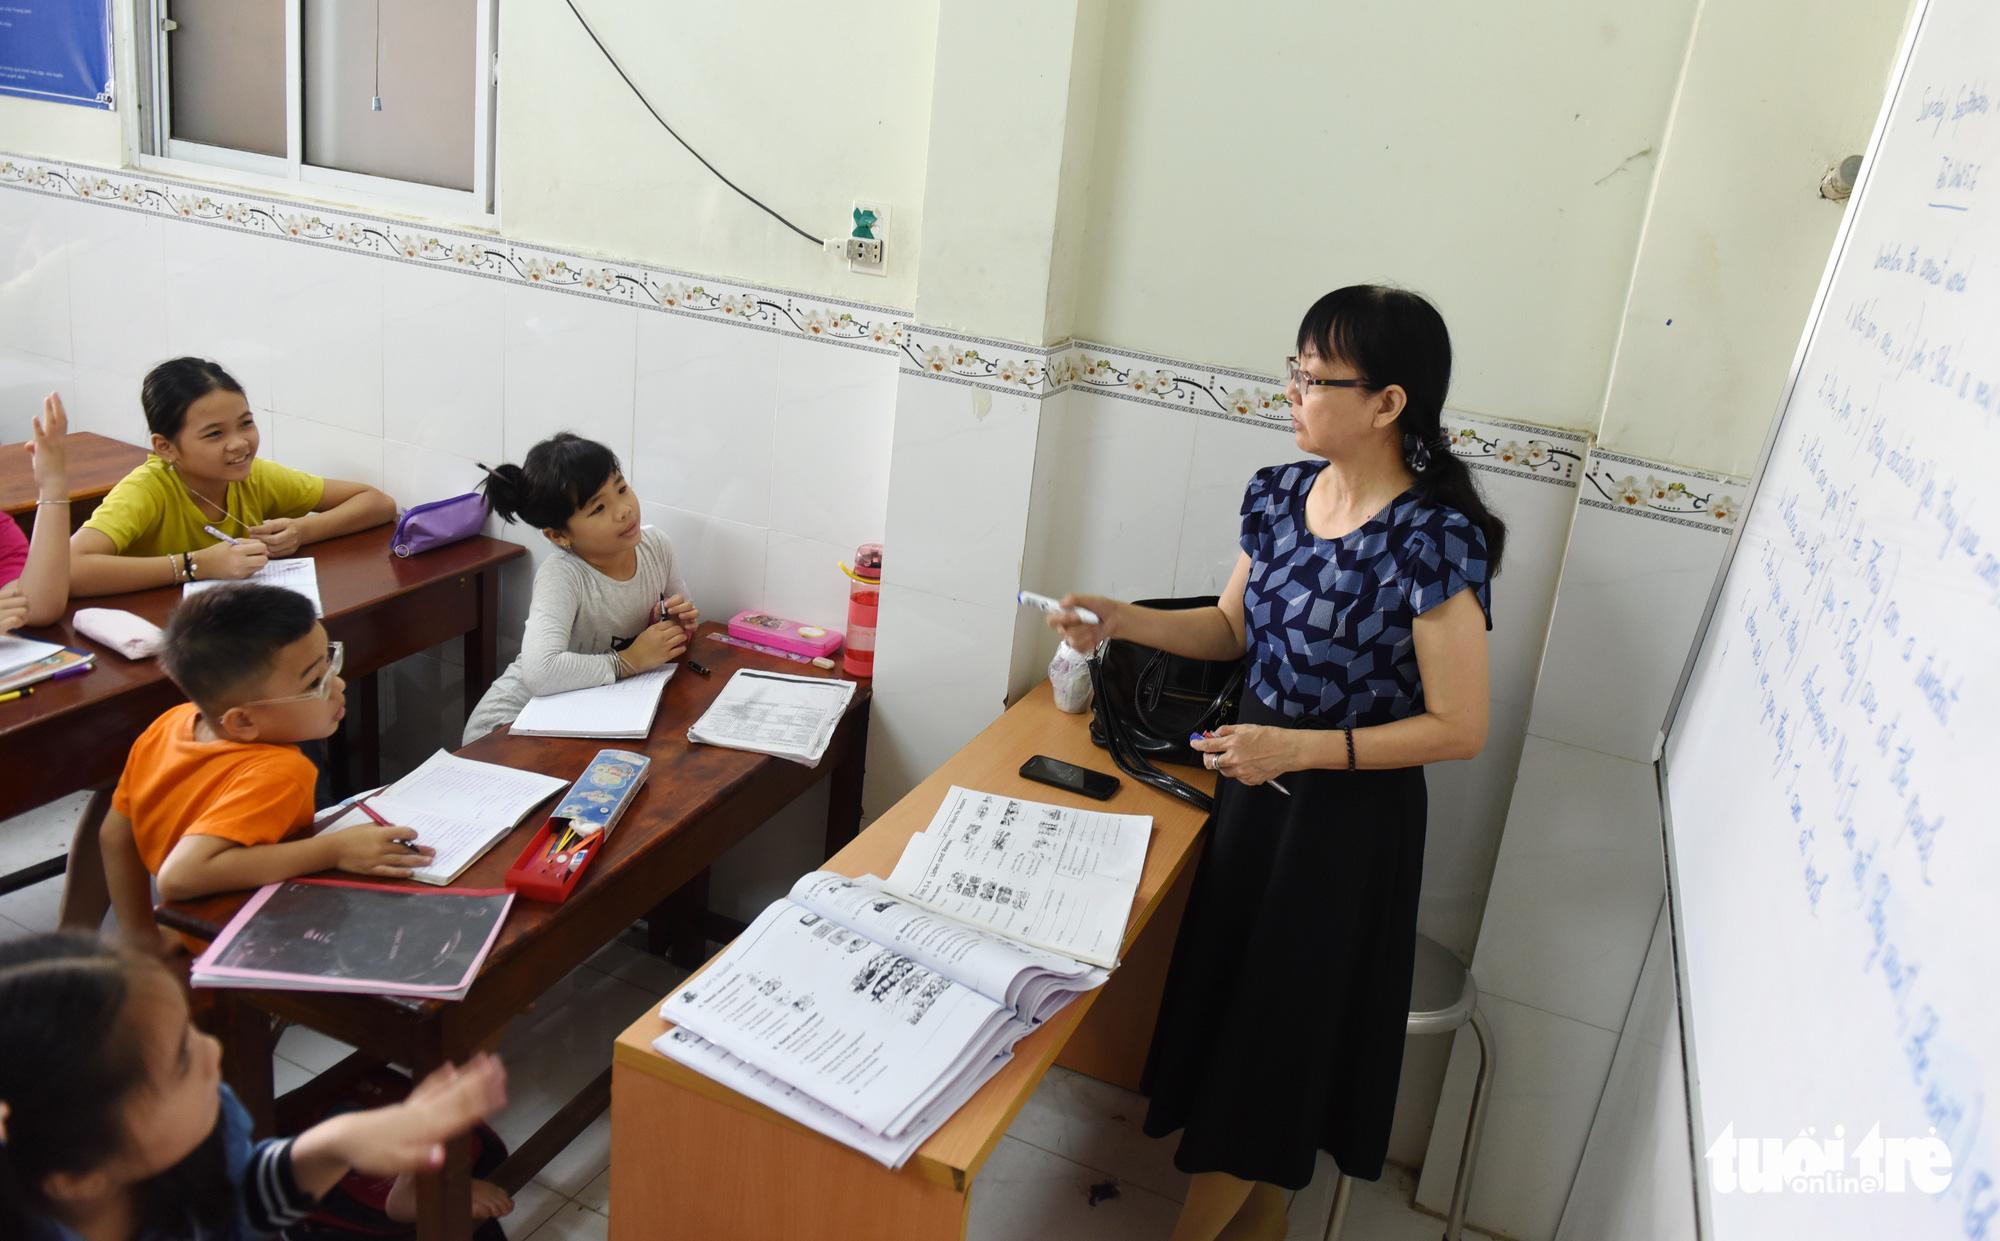 Dang Thi Huyen Thu teaches a foreign language class at La Pagoda in Go Vap District, Ho Chi Minh City, September 13, 2020. Photo: Duyen Phan / Tuoi Tre